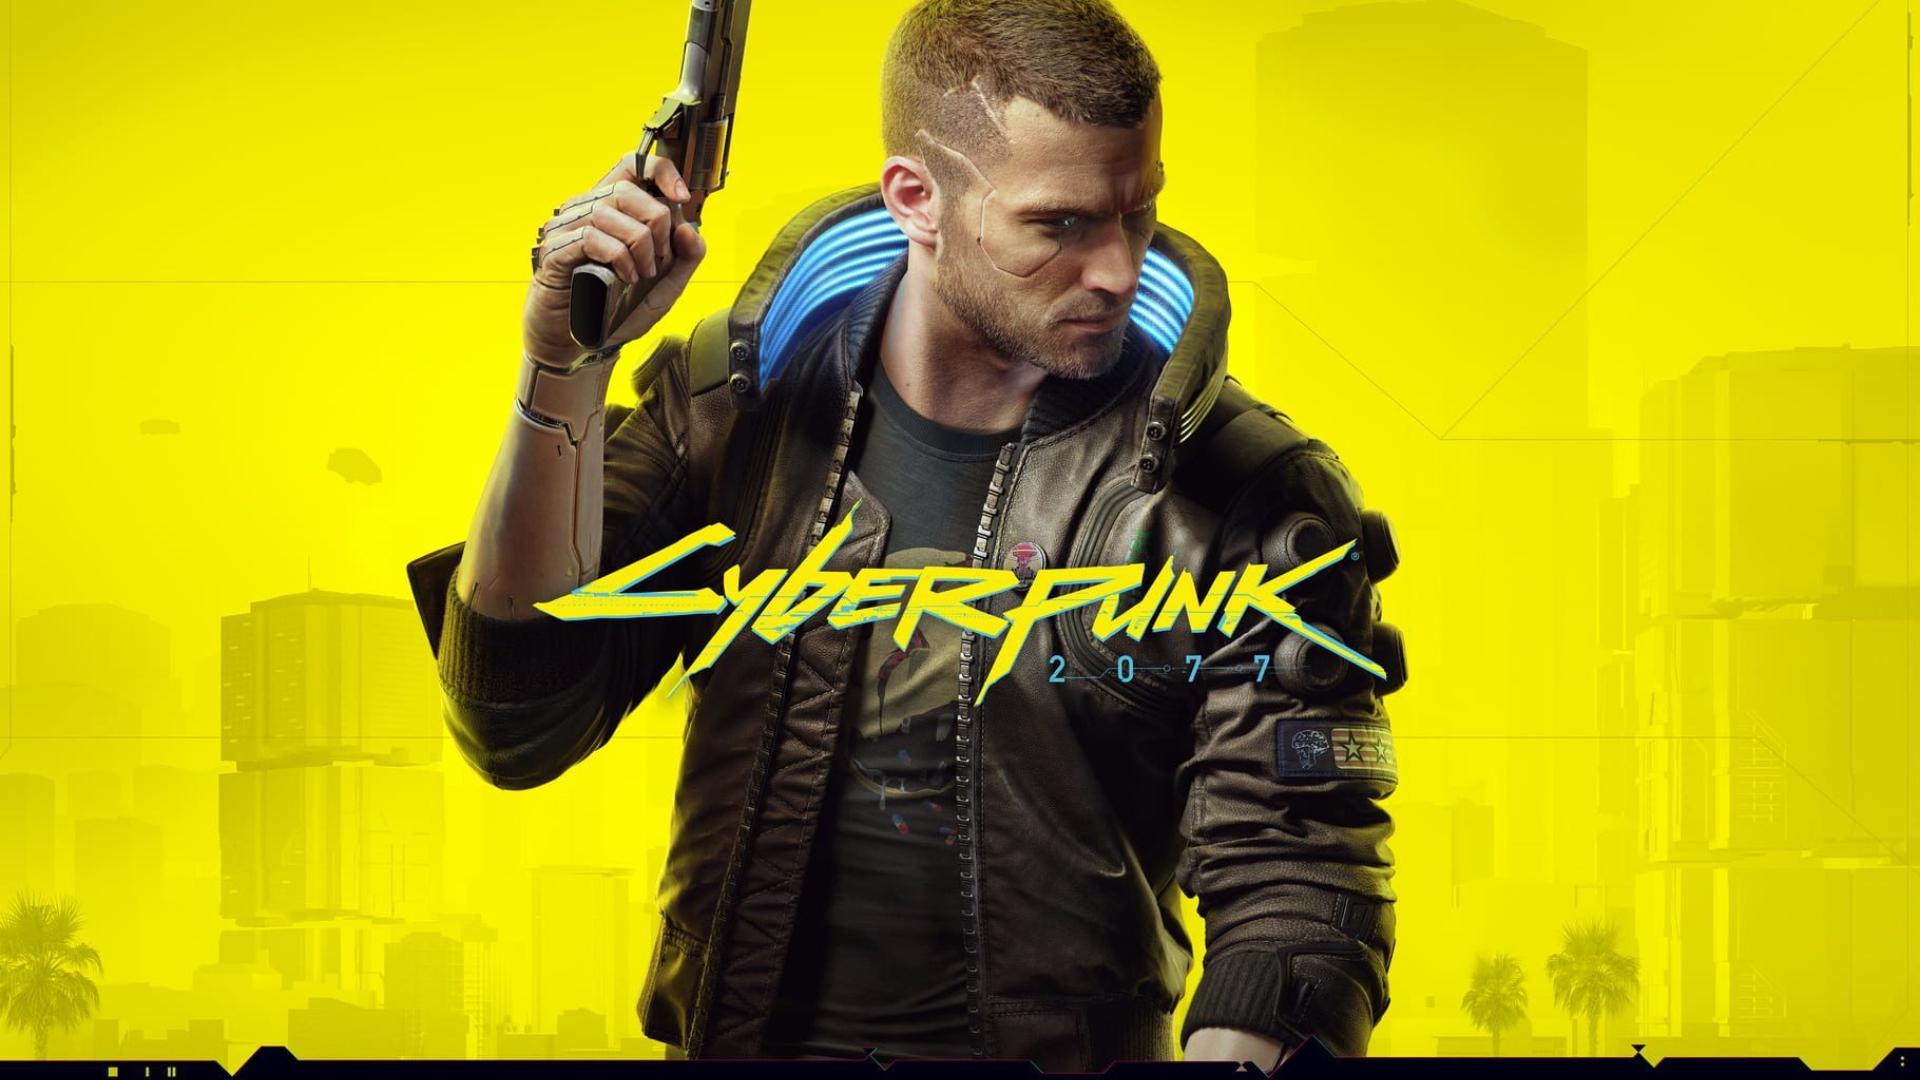 Cyberpunk 2077 - Poster